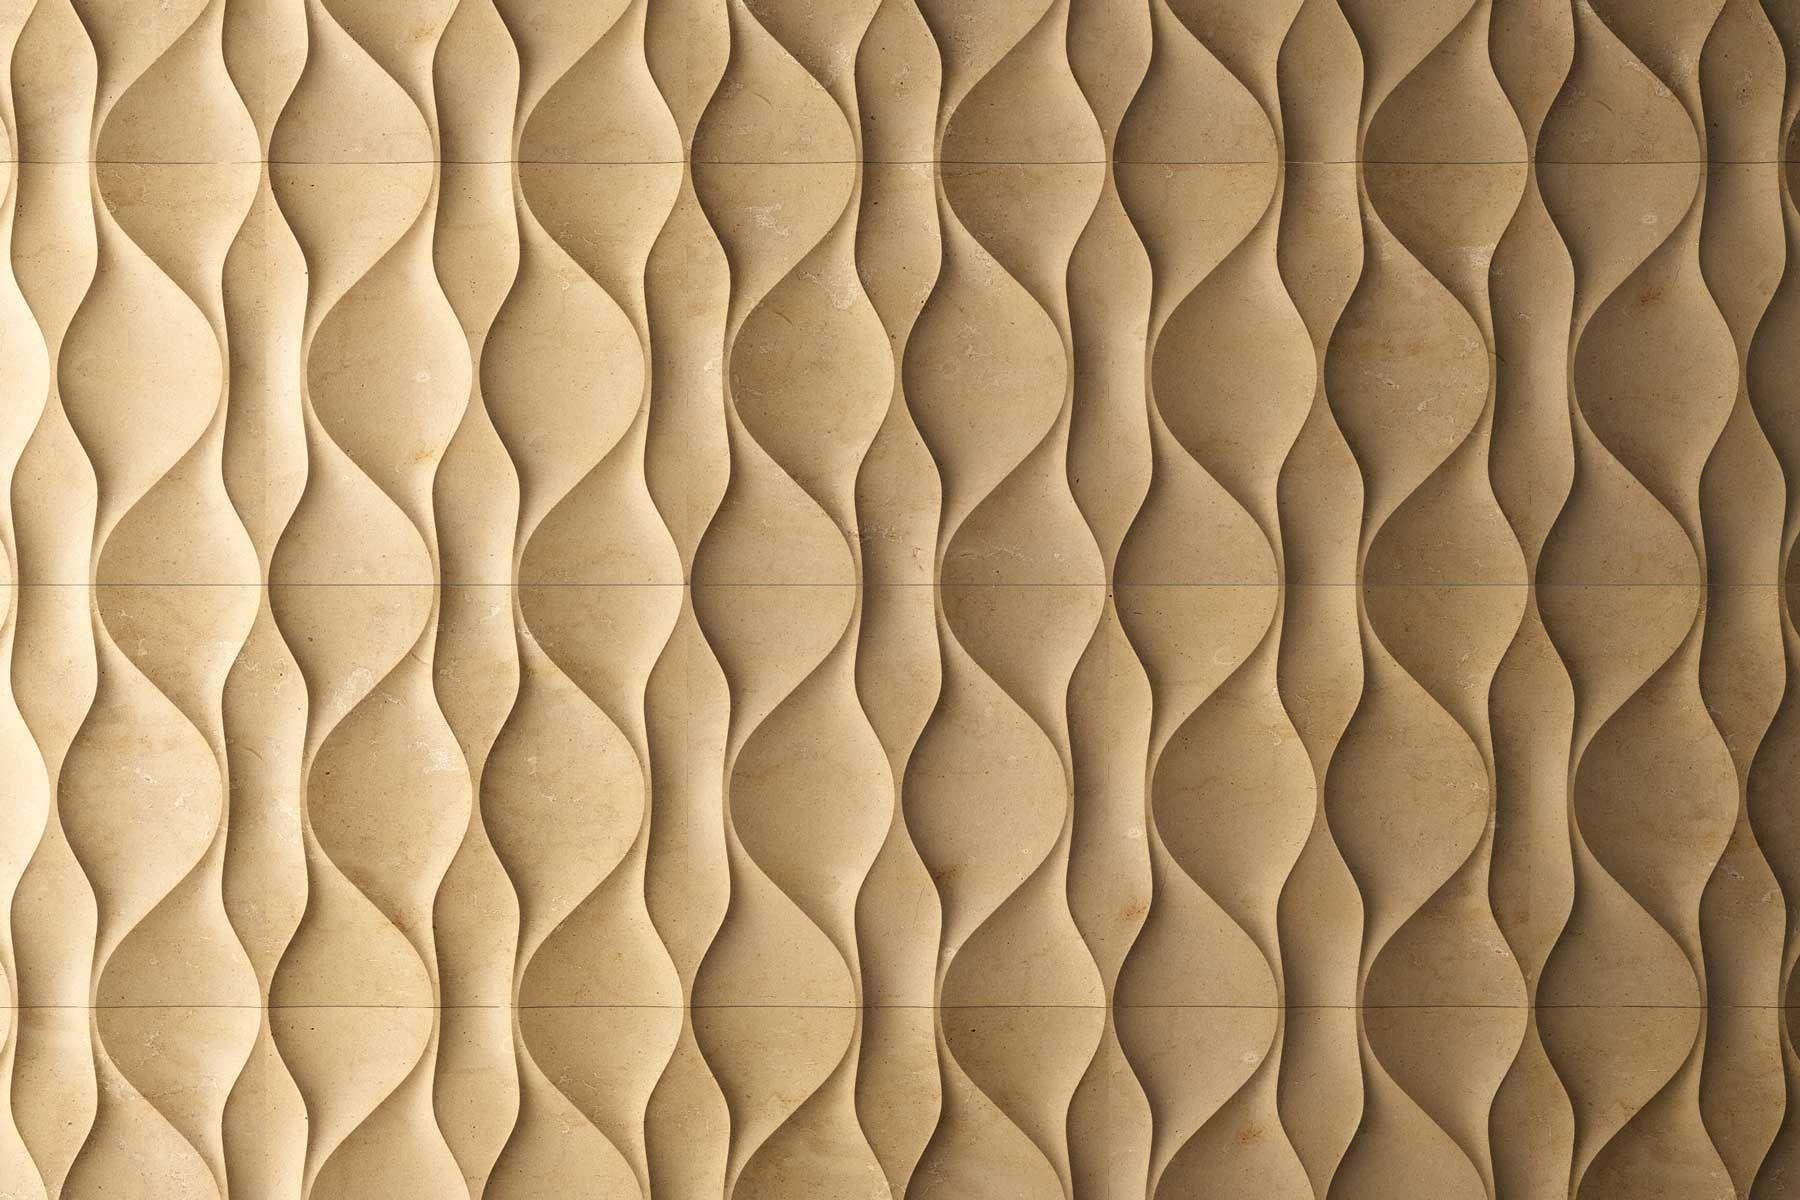 Petraform - decorative stone walls Flow F series | 82.3D surfaces ...